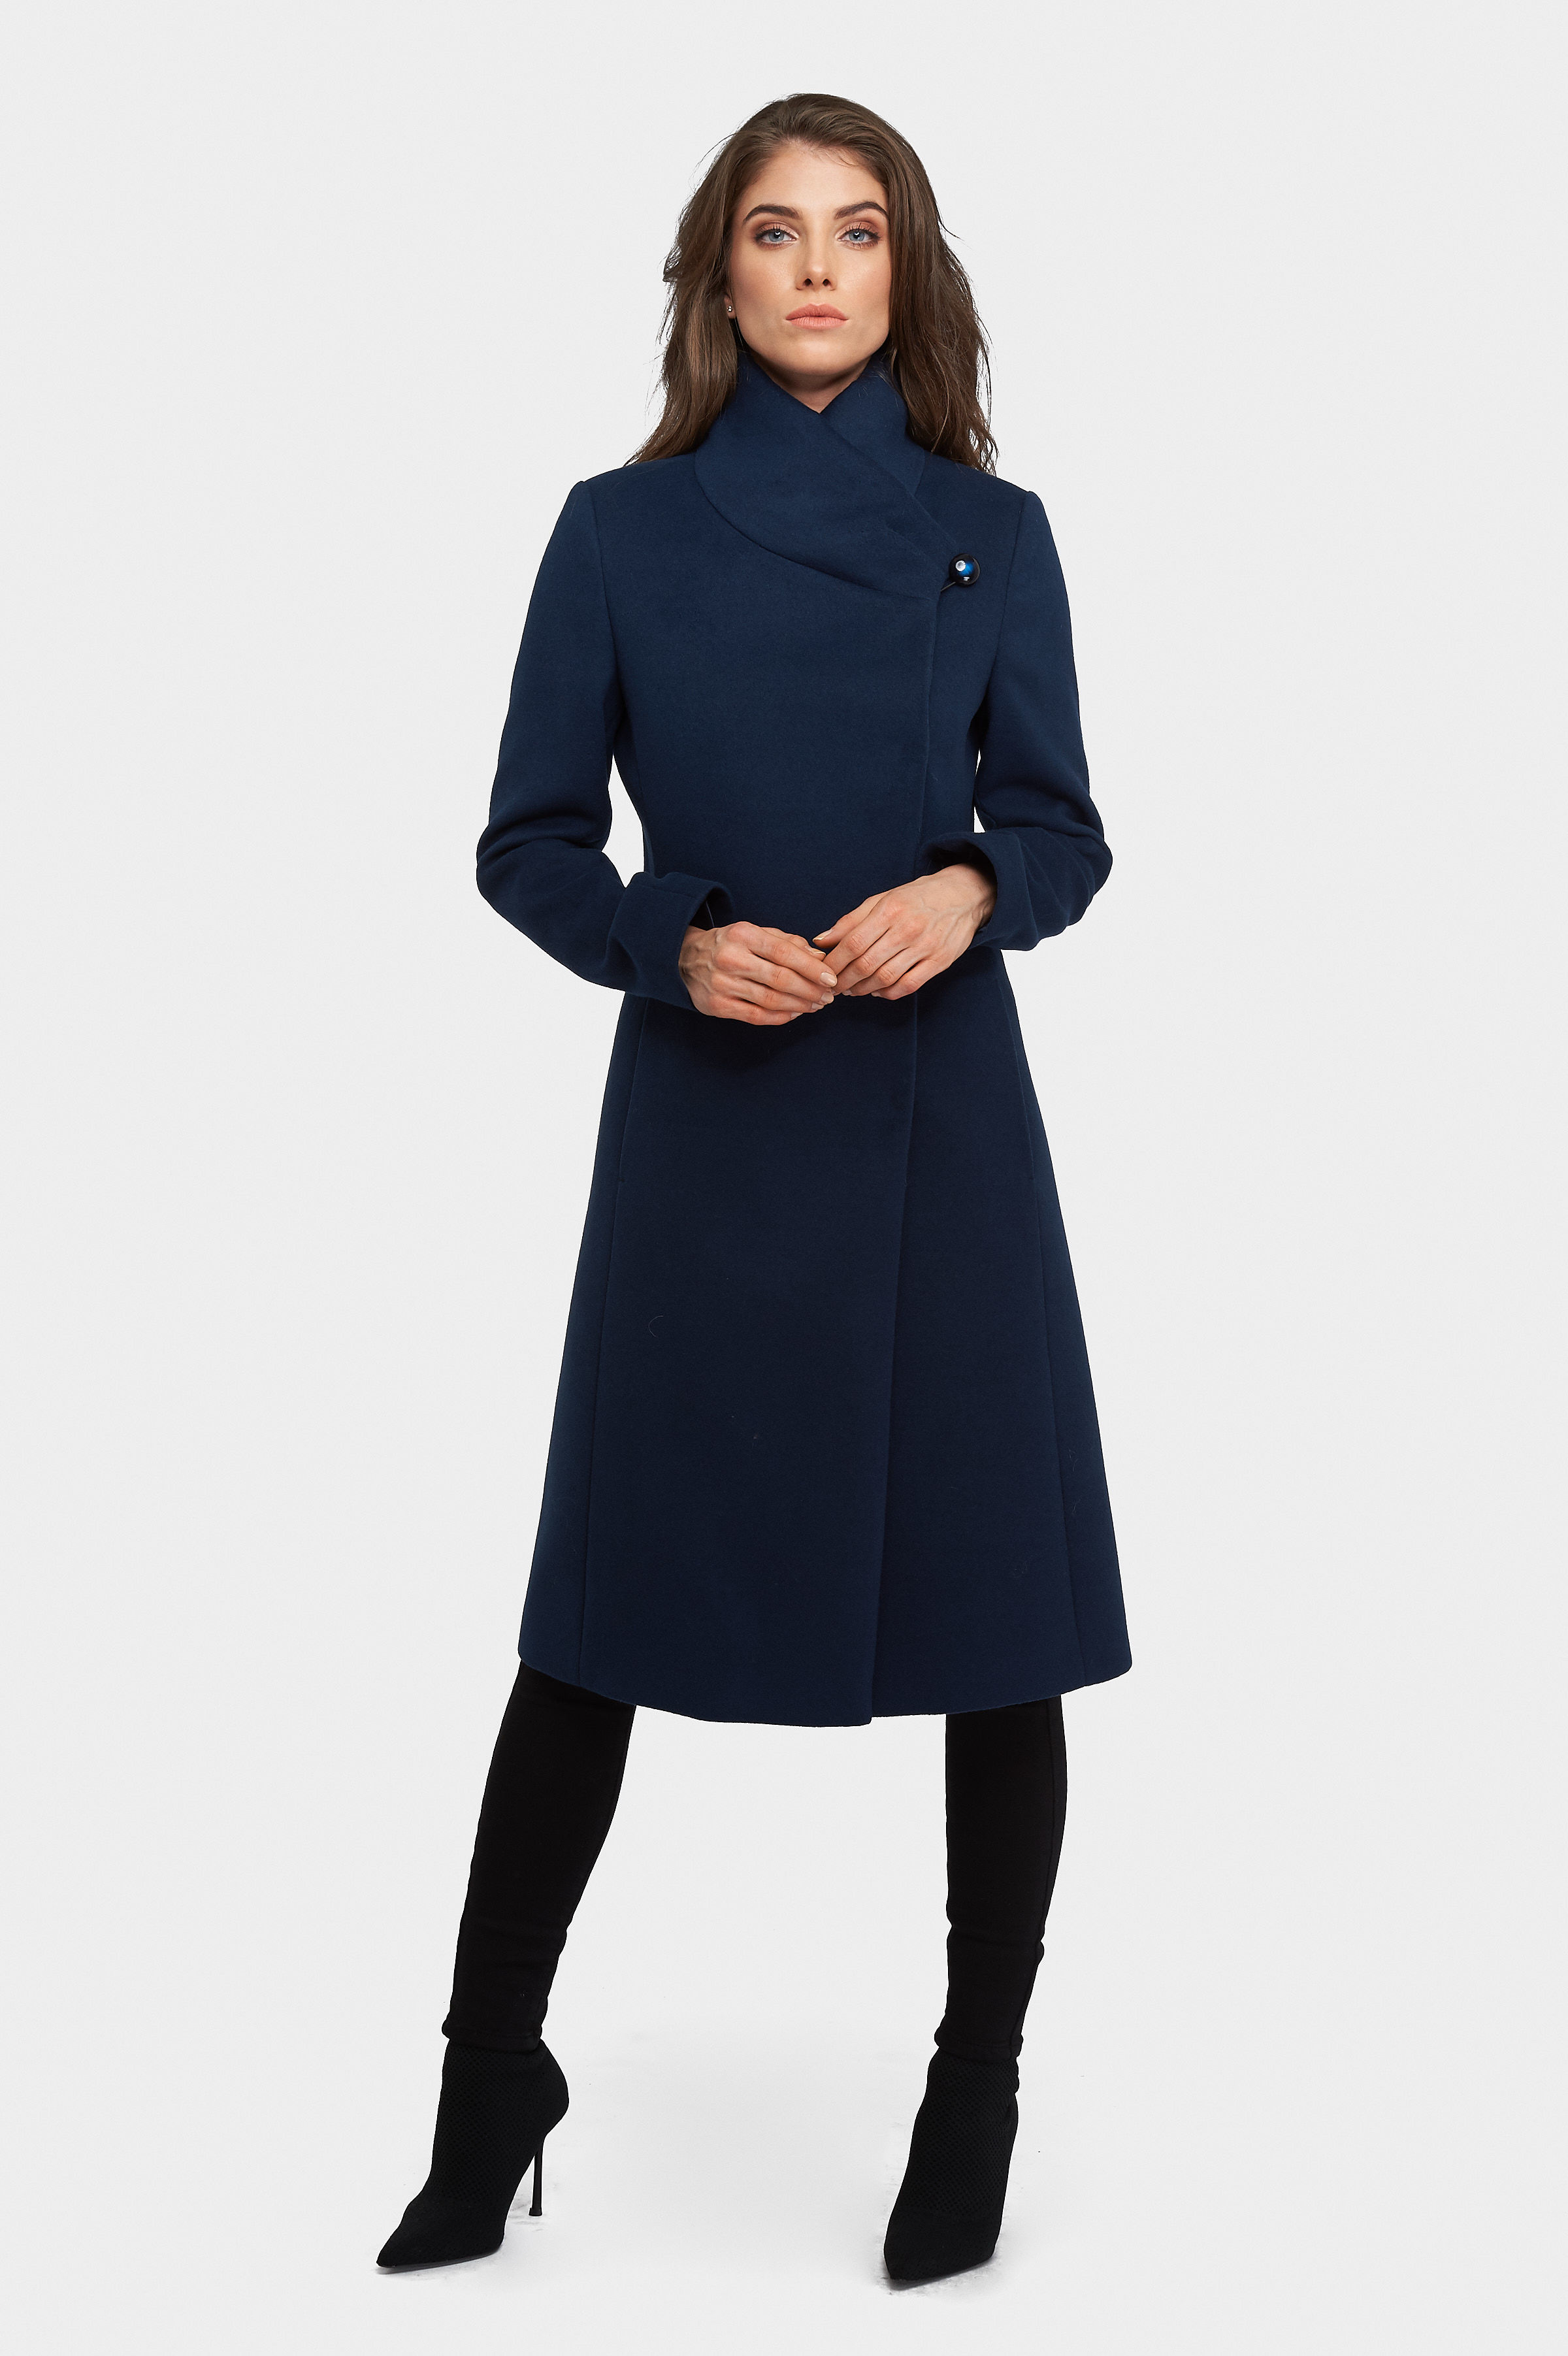 Kabát Miana - Chantall.sk a98b024879